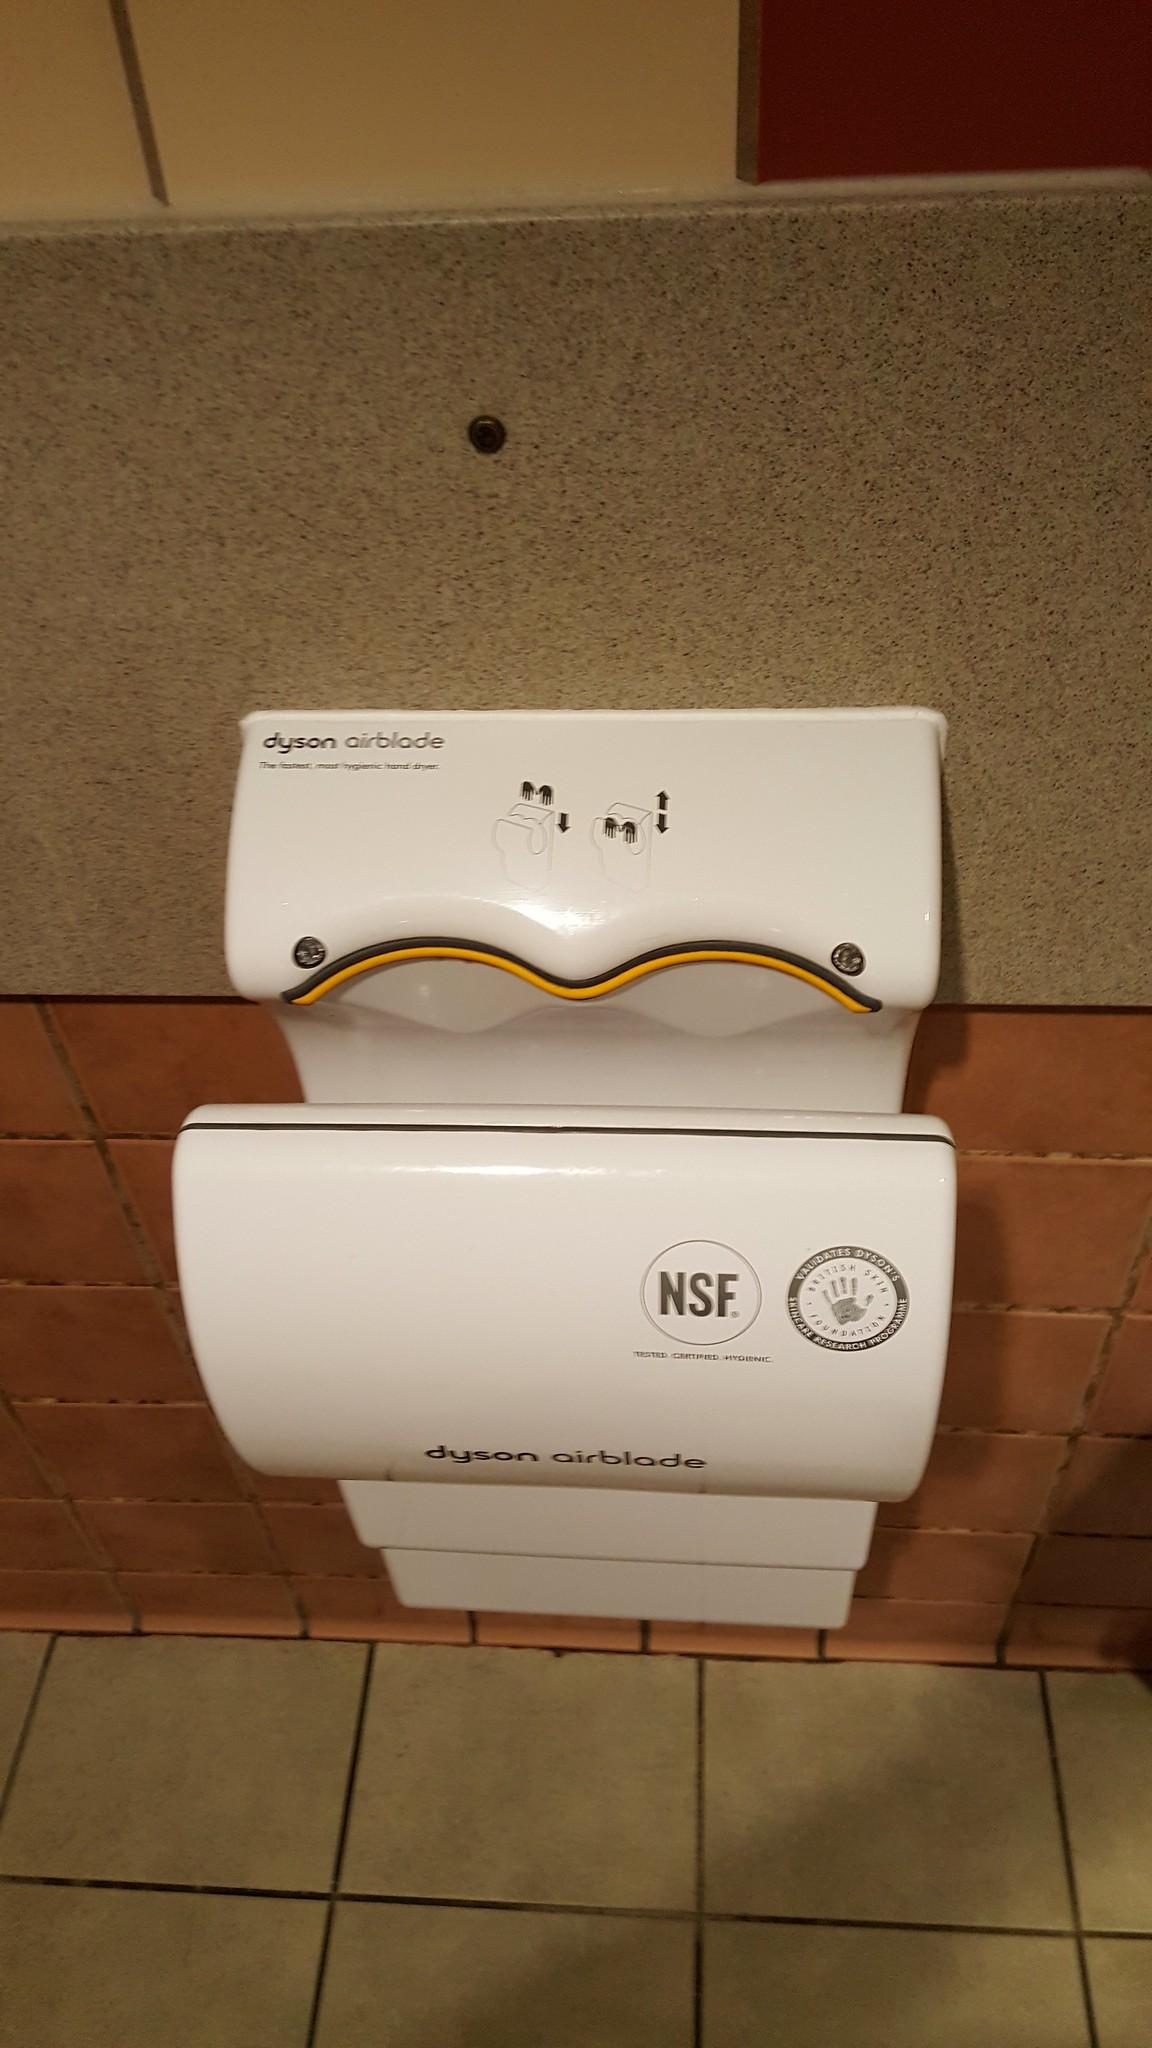 New urinal